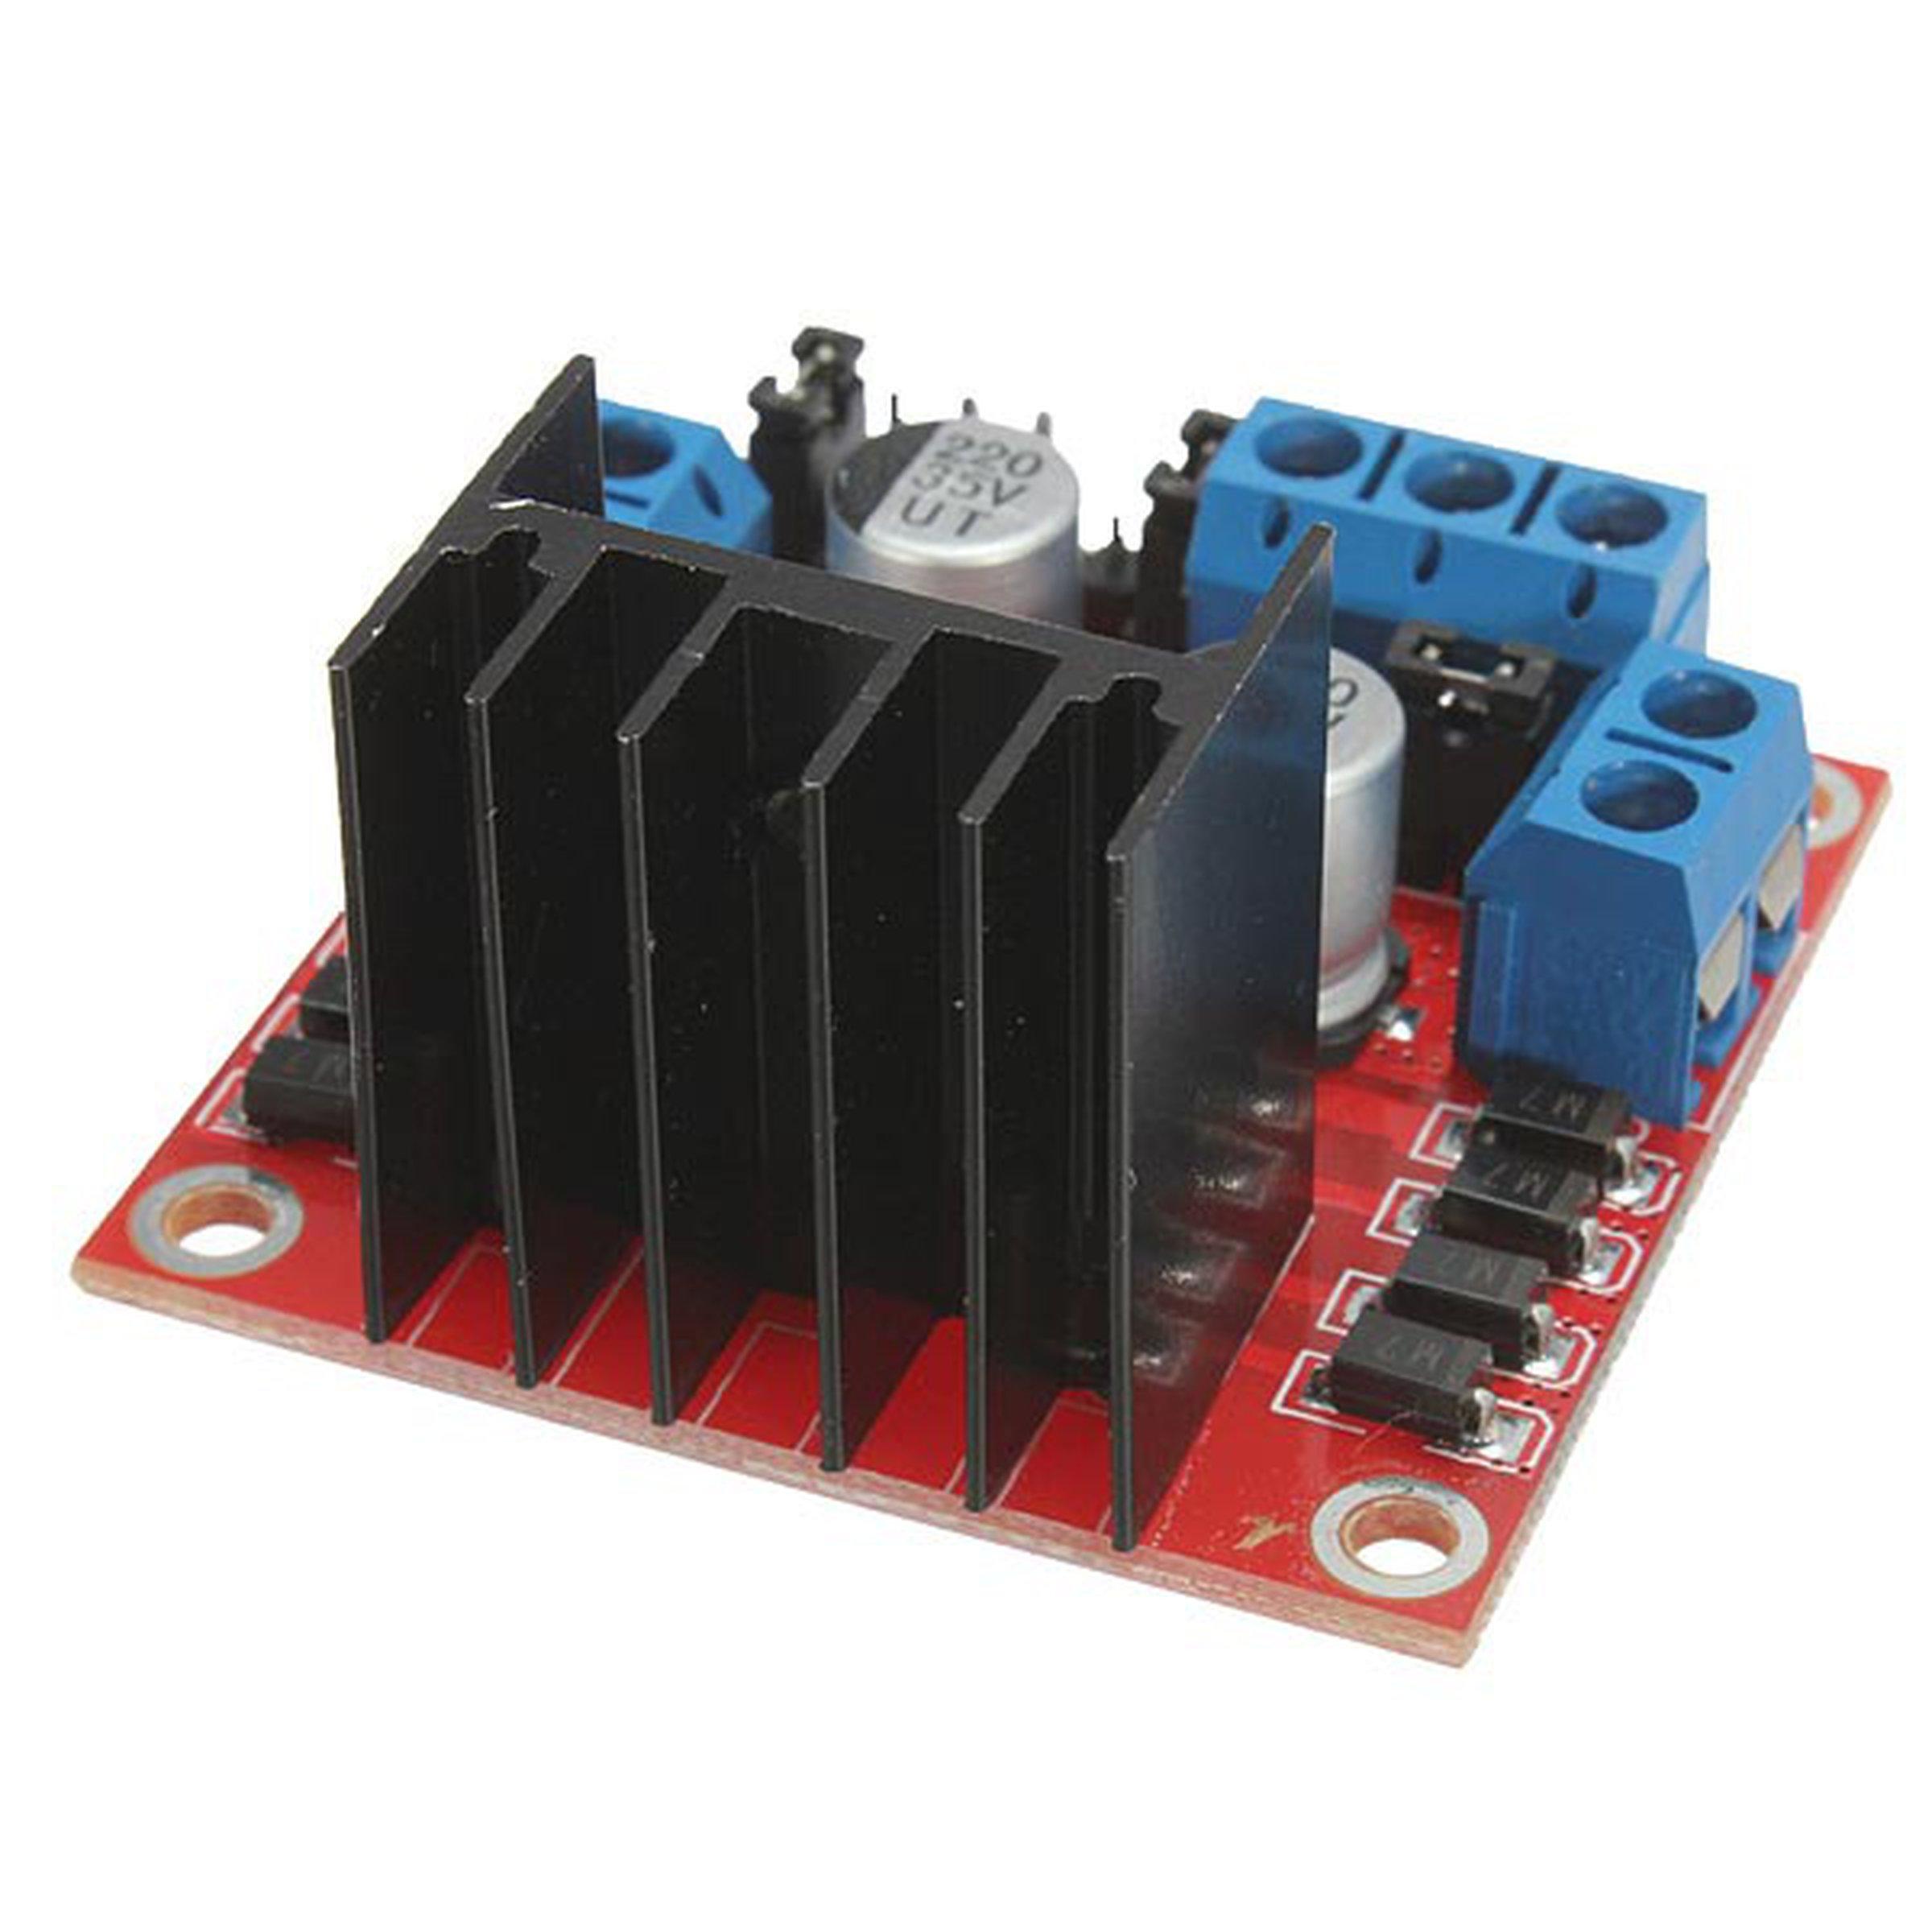 L298n Dual H Bridge Dc Stepper Motor Driver Module Controller Board L298 Diagram Also With For Arduino 6